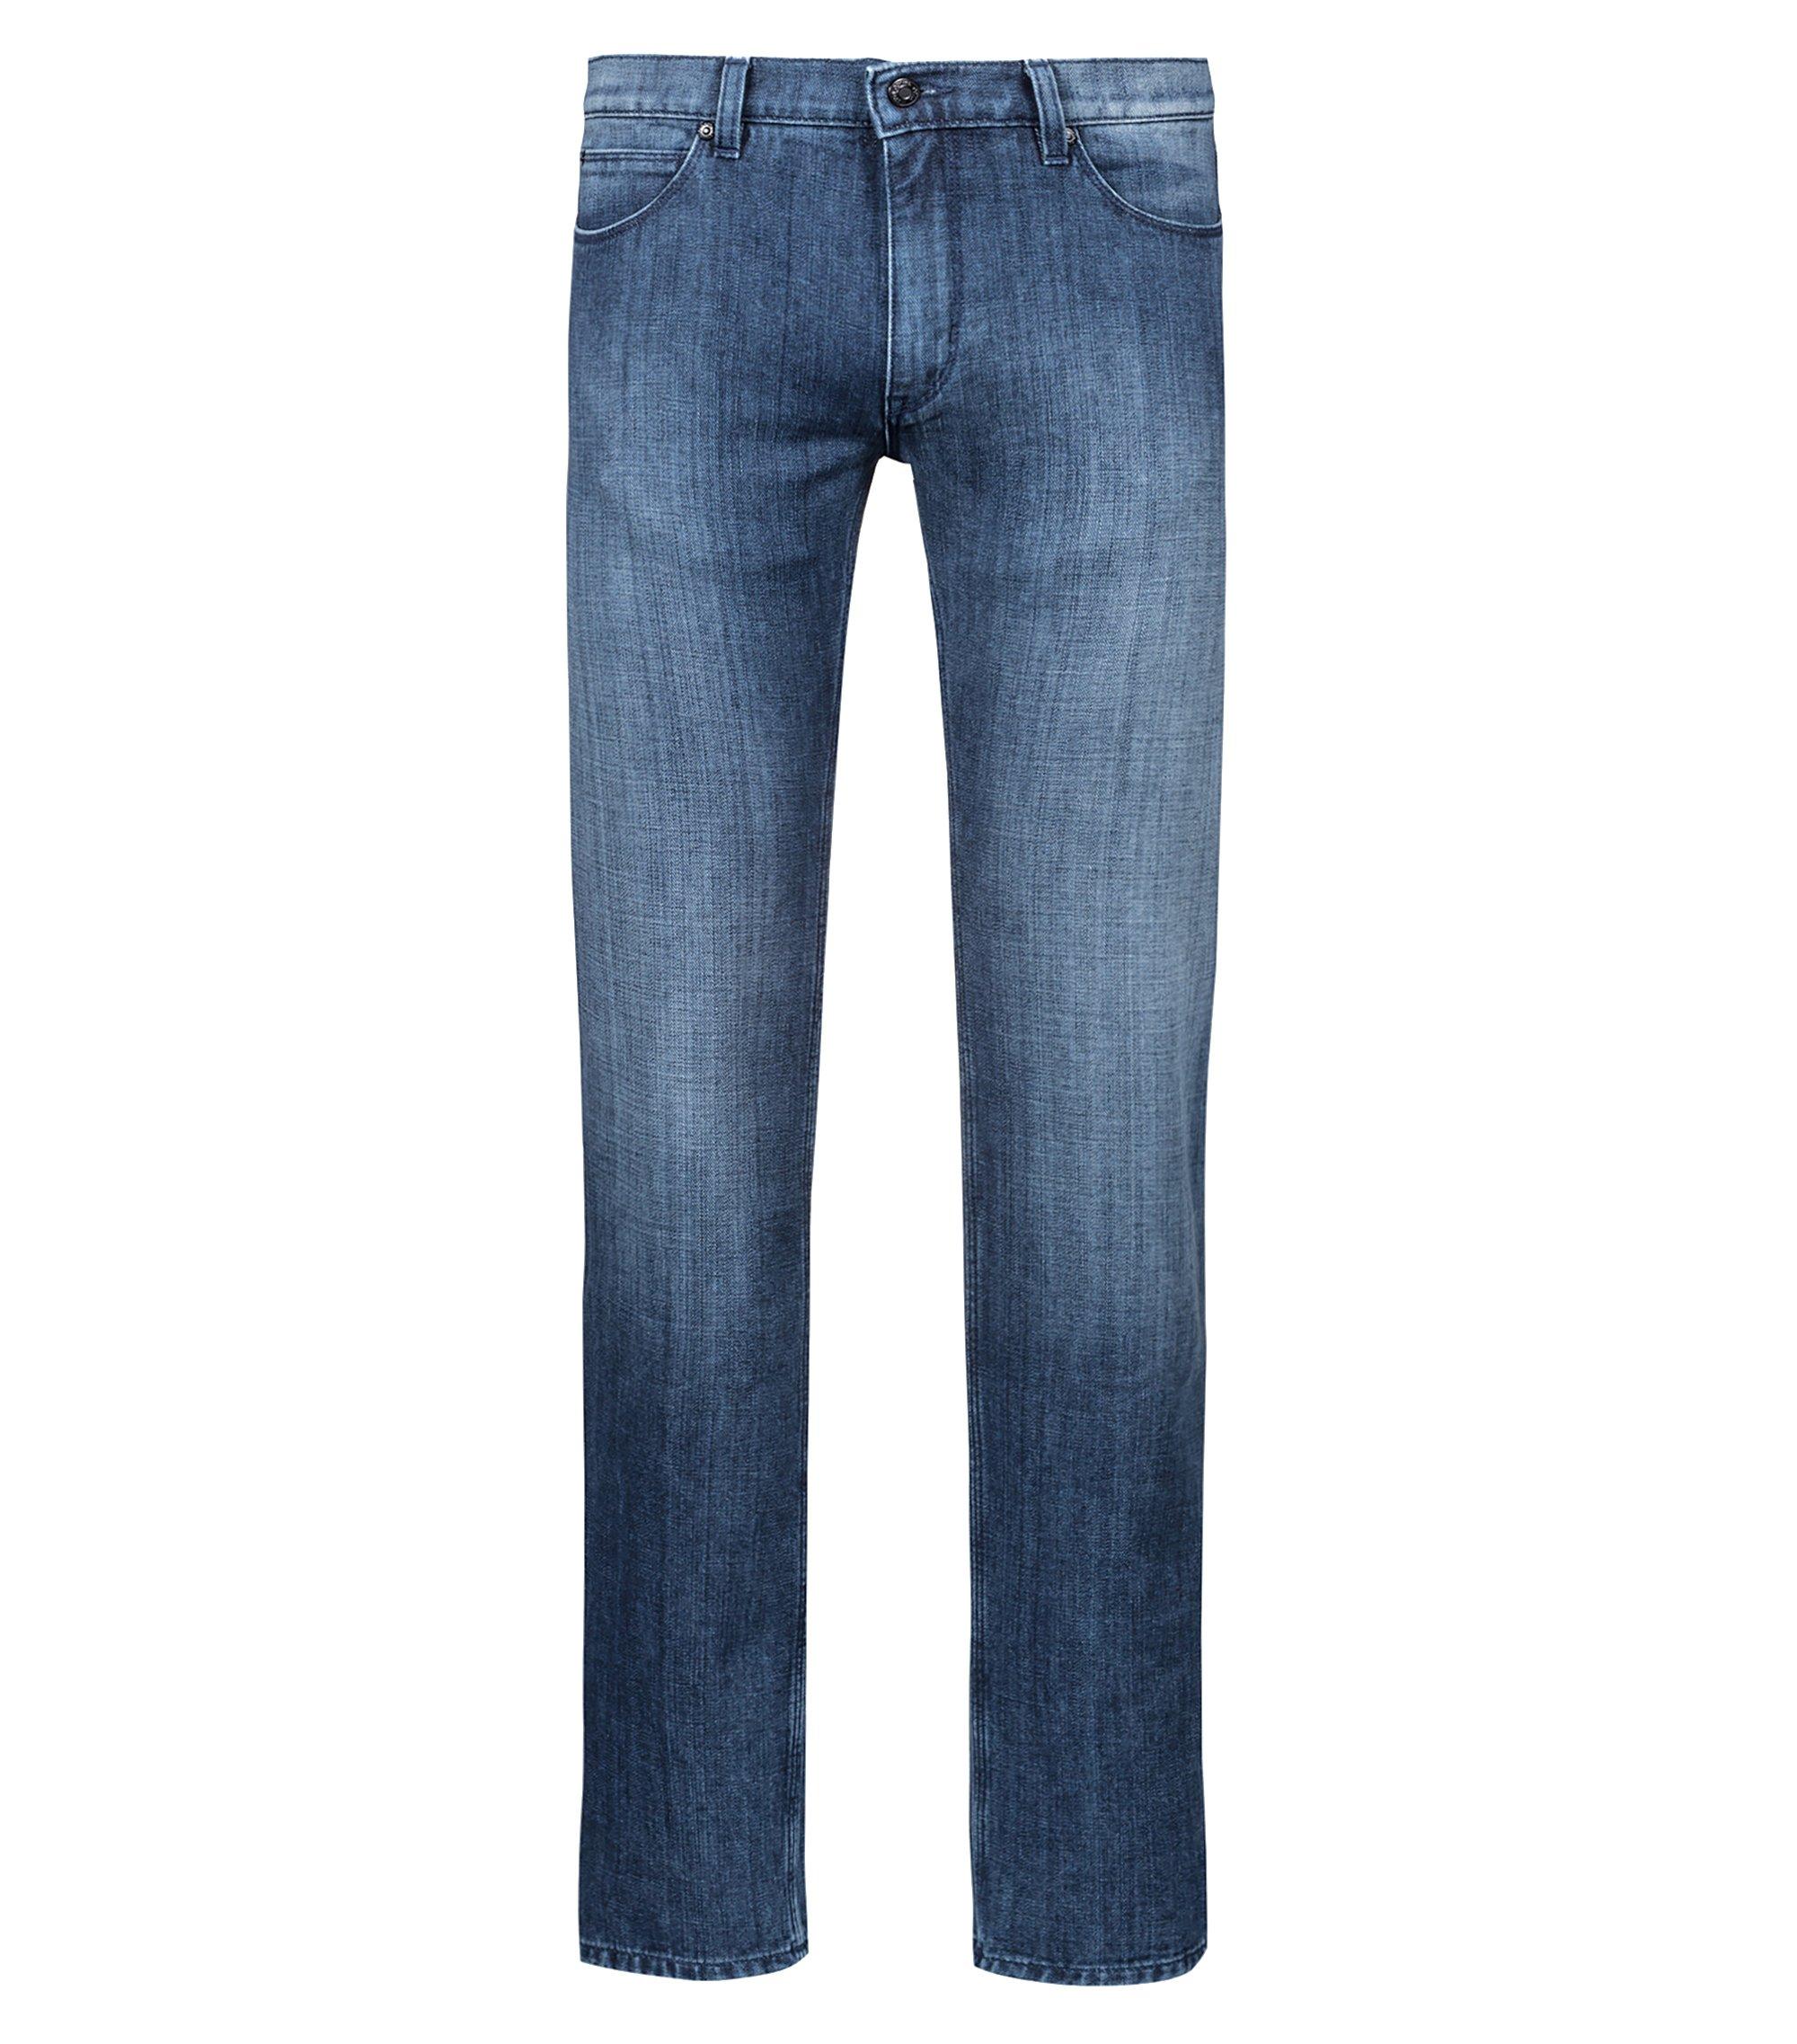 Slim-Fit Jeans aus Denim aus der Bits&Bytes Capsule, Blau